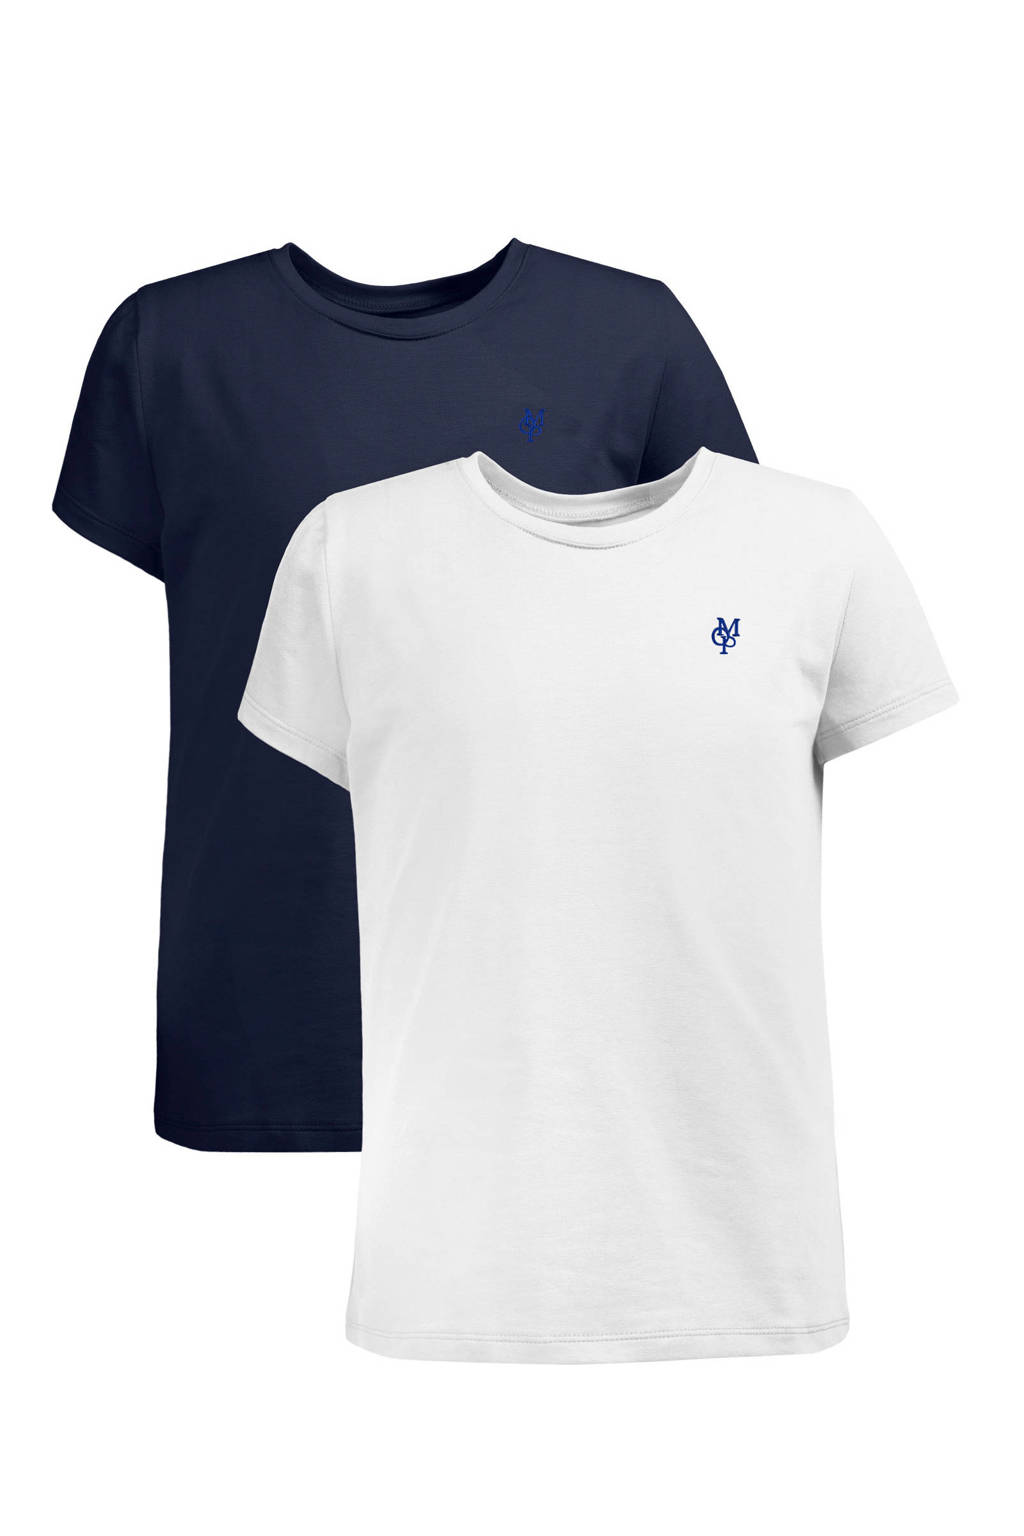 Marc O'Polo T-shirt met korte mouwen (set van 2), marine/ wit